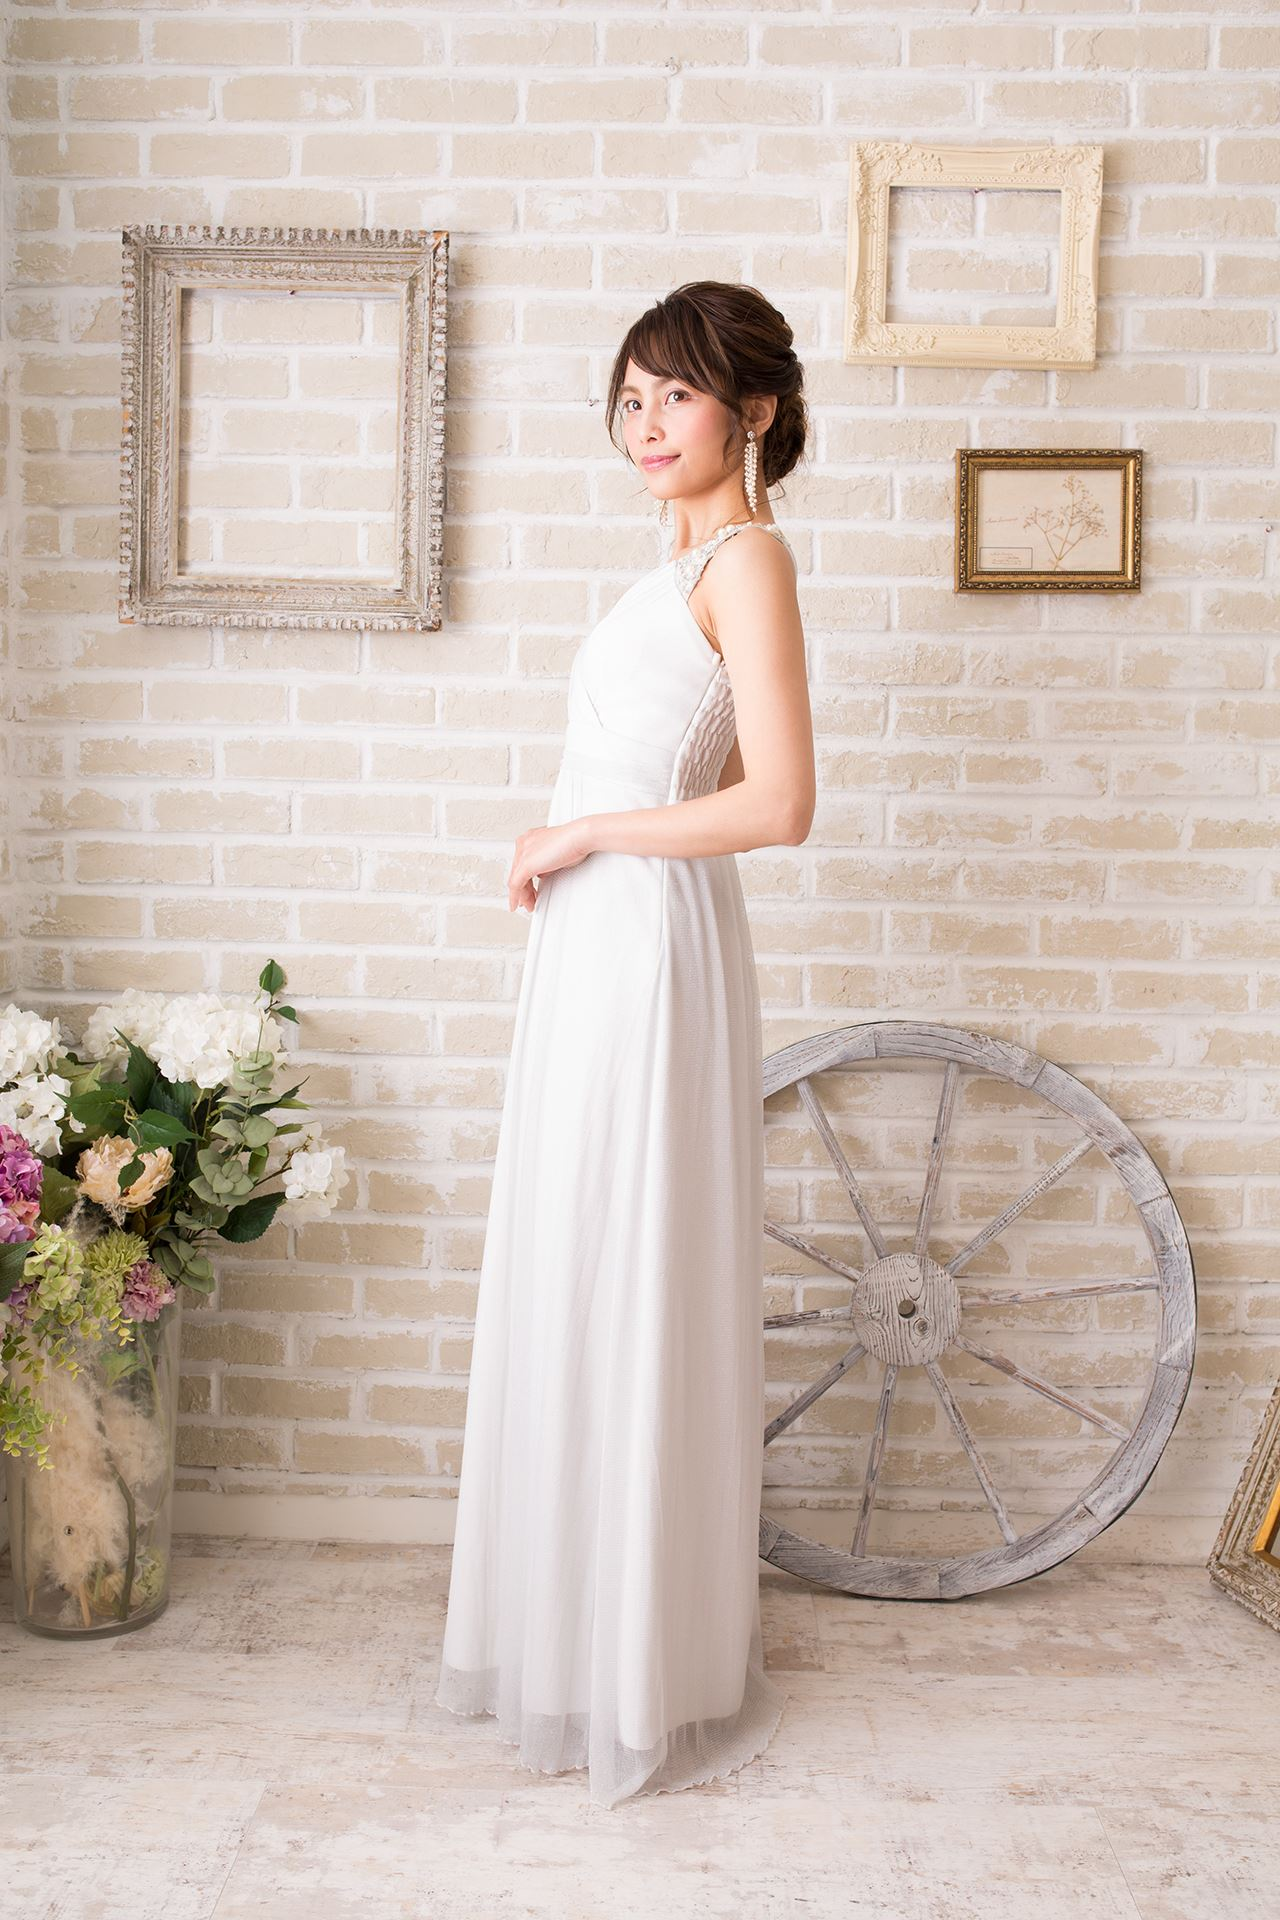 yk_nr_dress_405